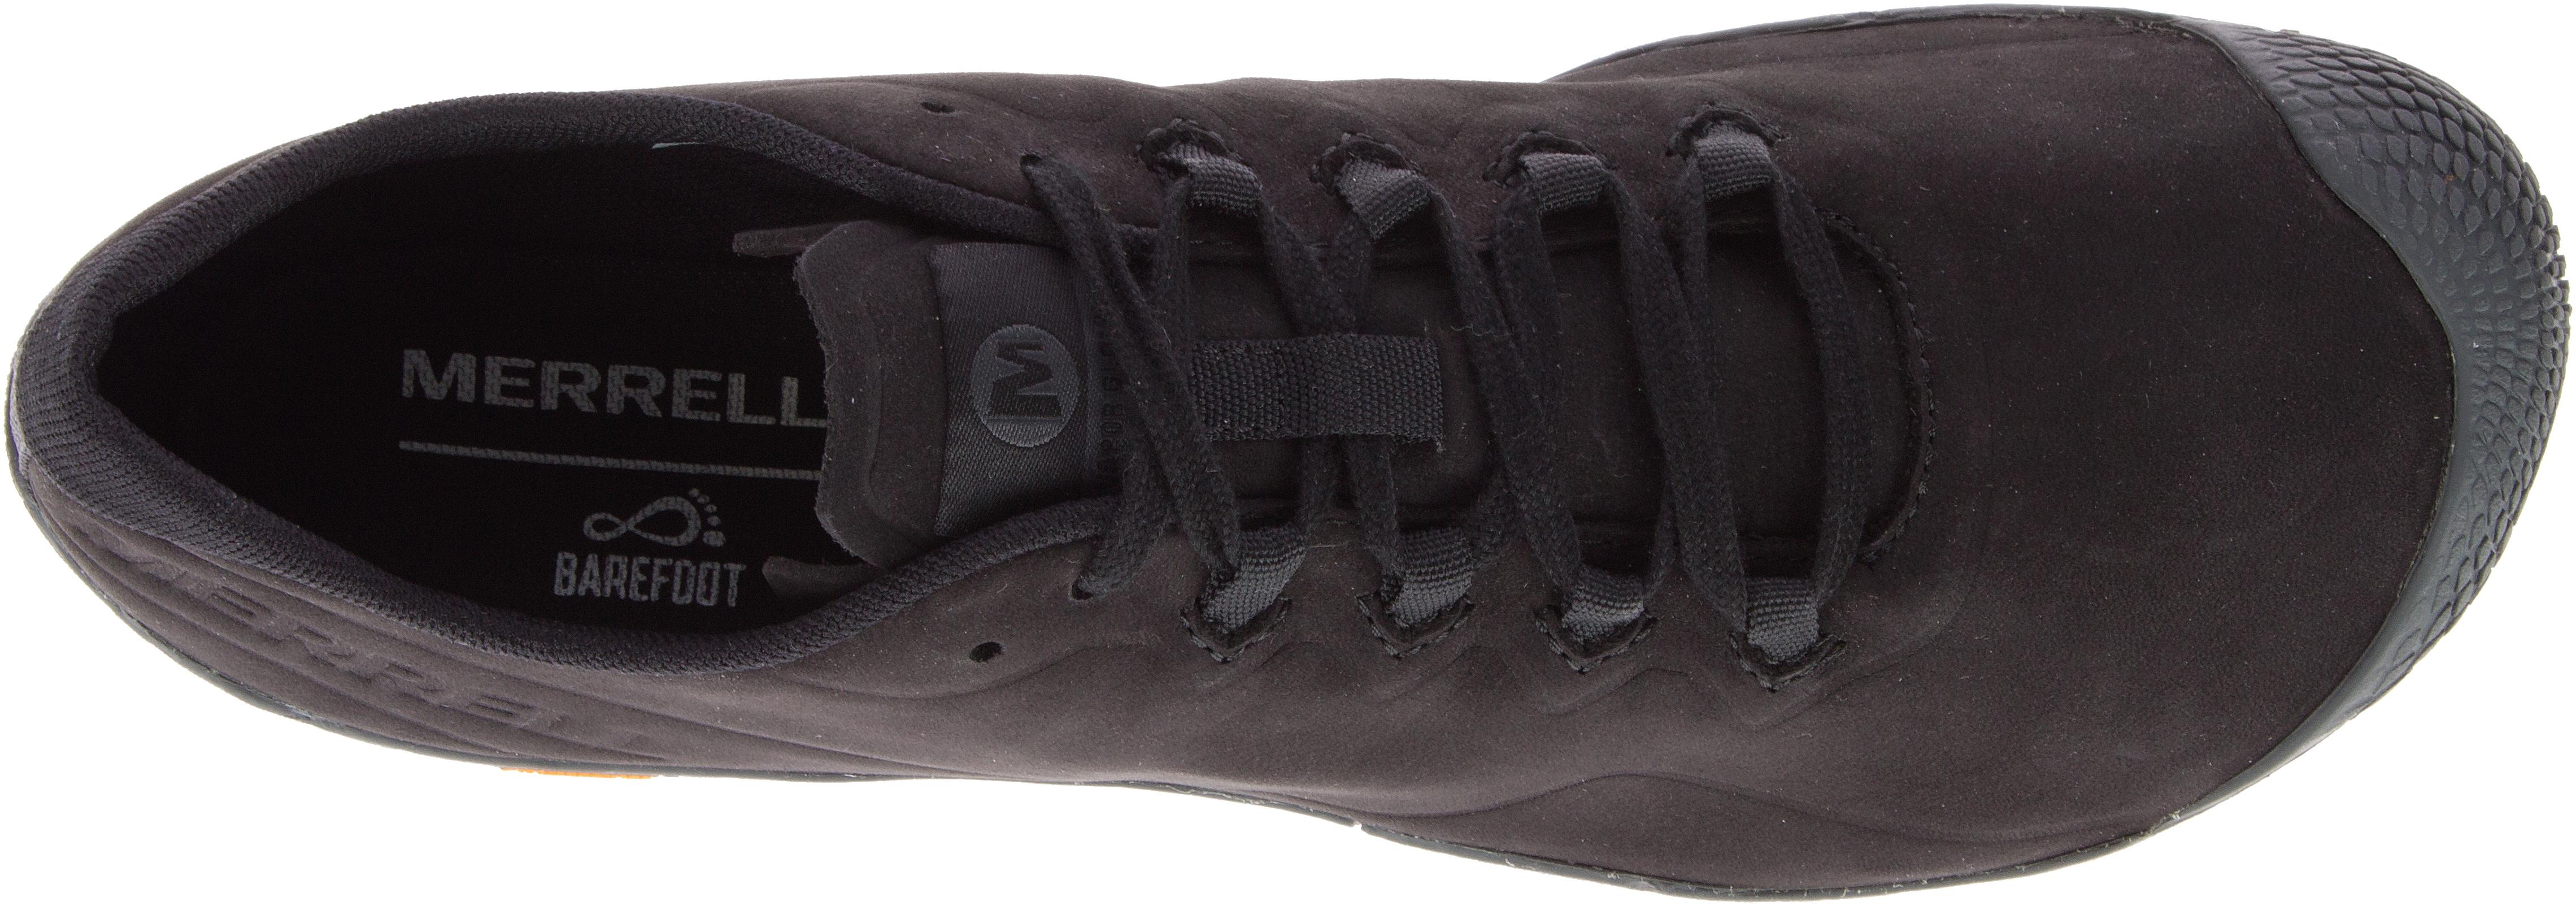 Vapor Glove Luna 3 Leather, Black